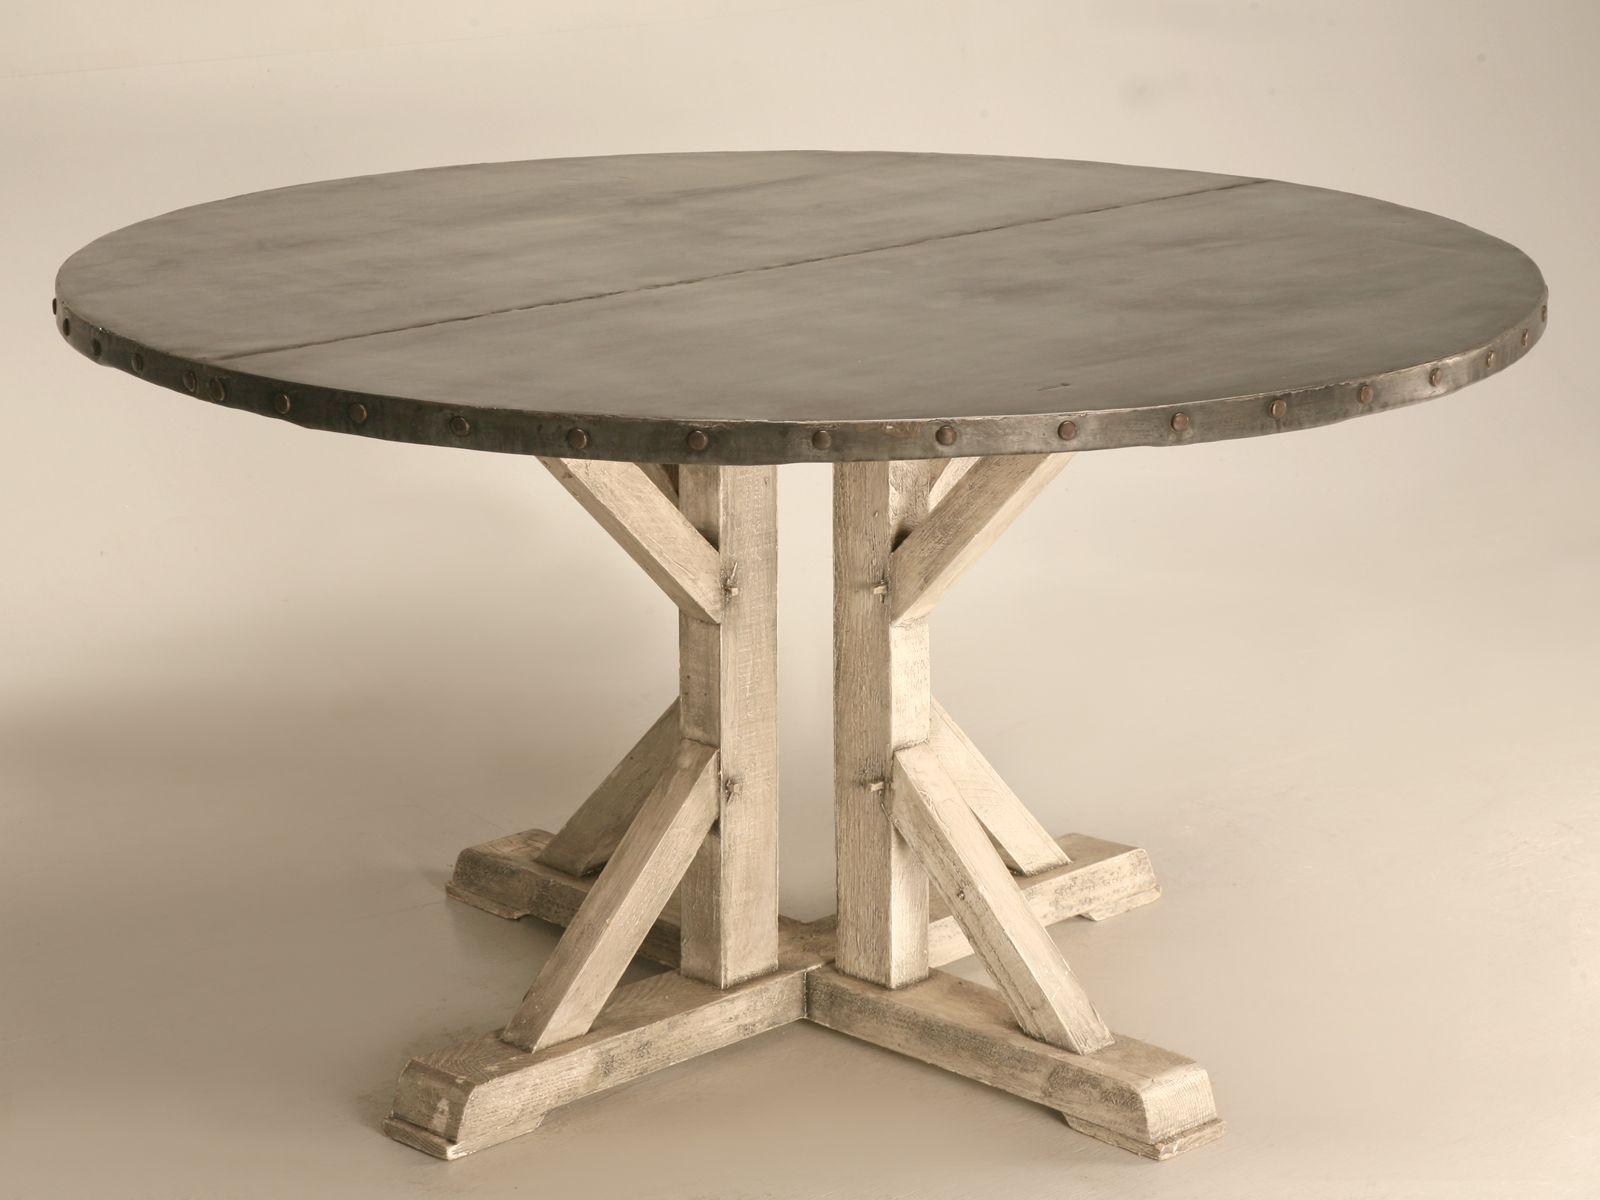 Round Zinc Kitchen Table  Kitchen table, Dining table, Round